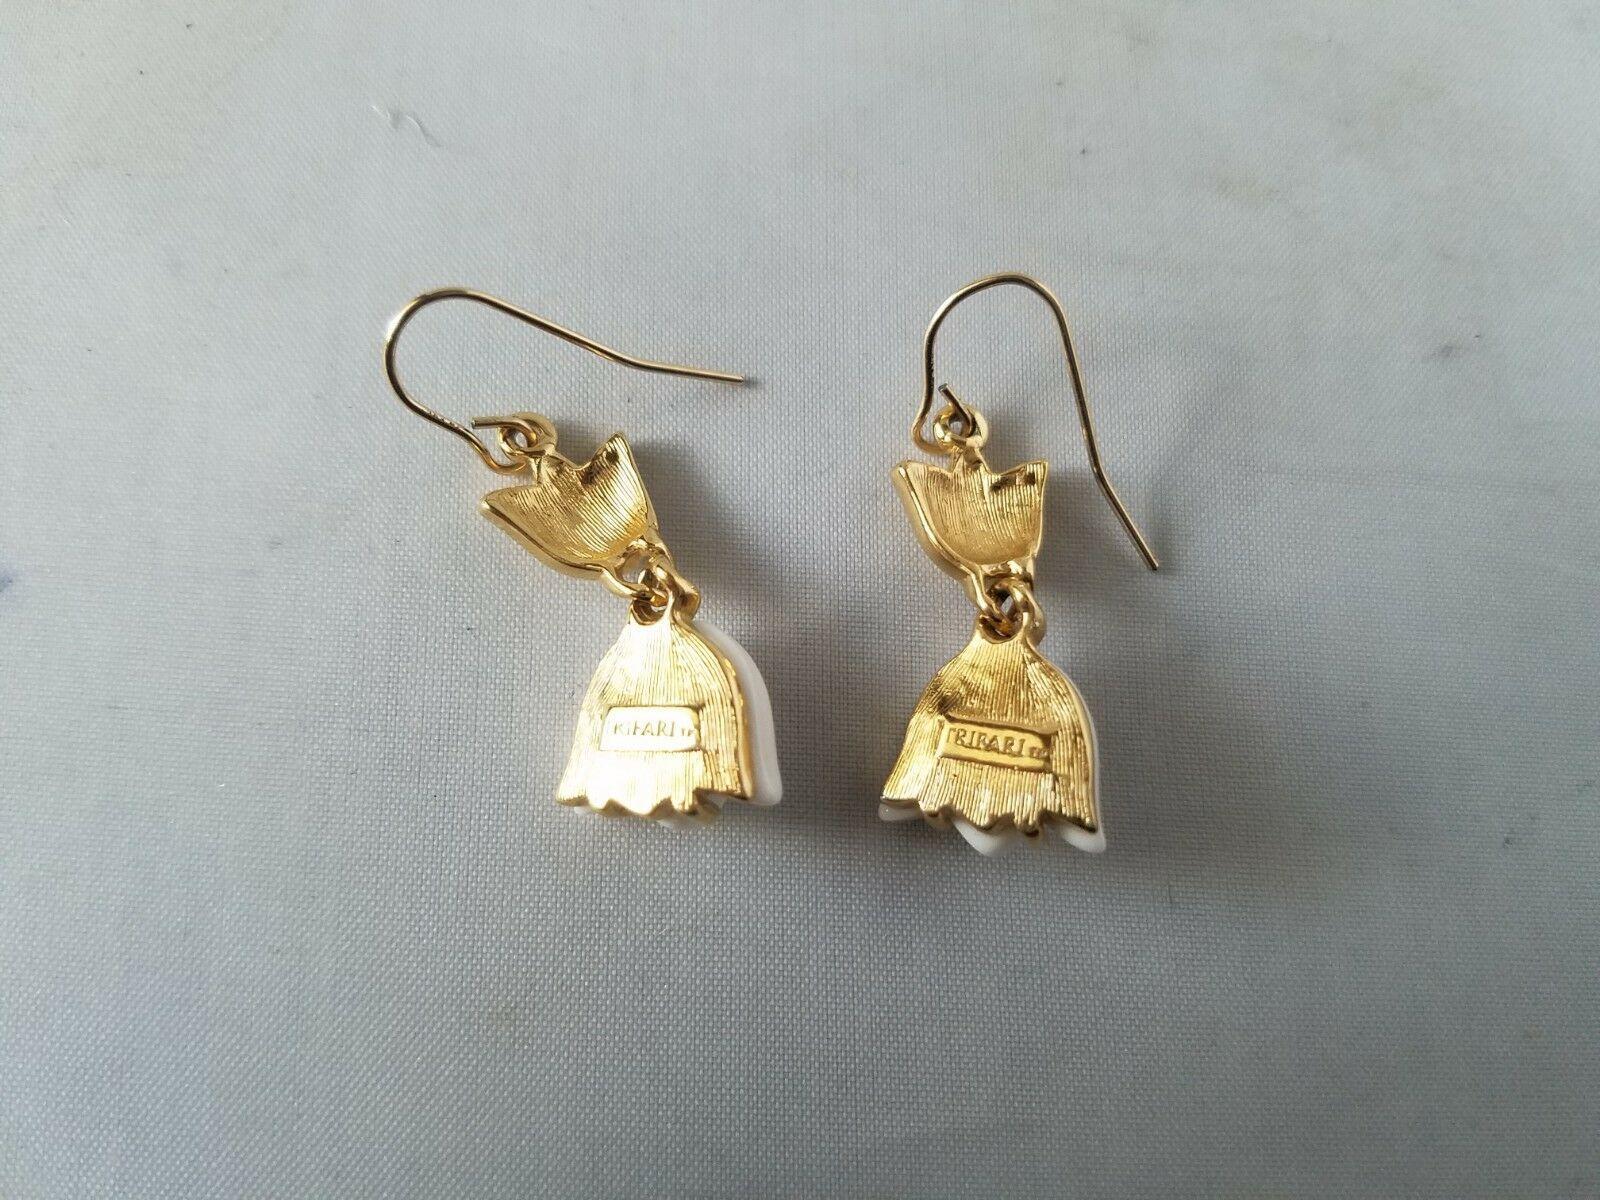 Trifari Vintage Earrings White Enamel Lotus Gold Tone Dangle Fashion Jewelry